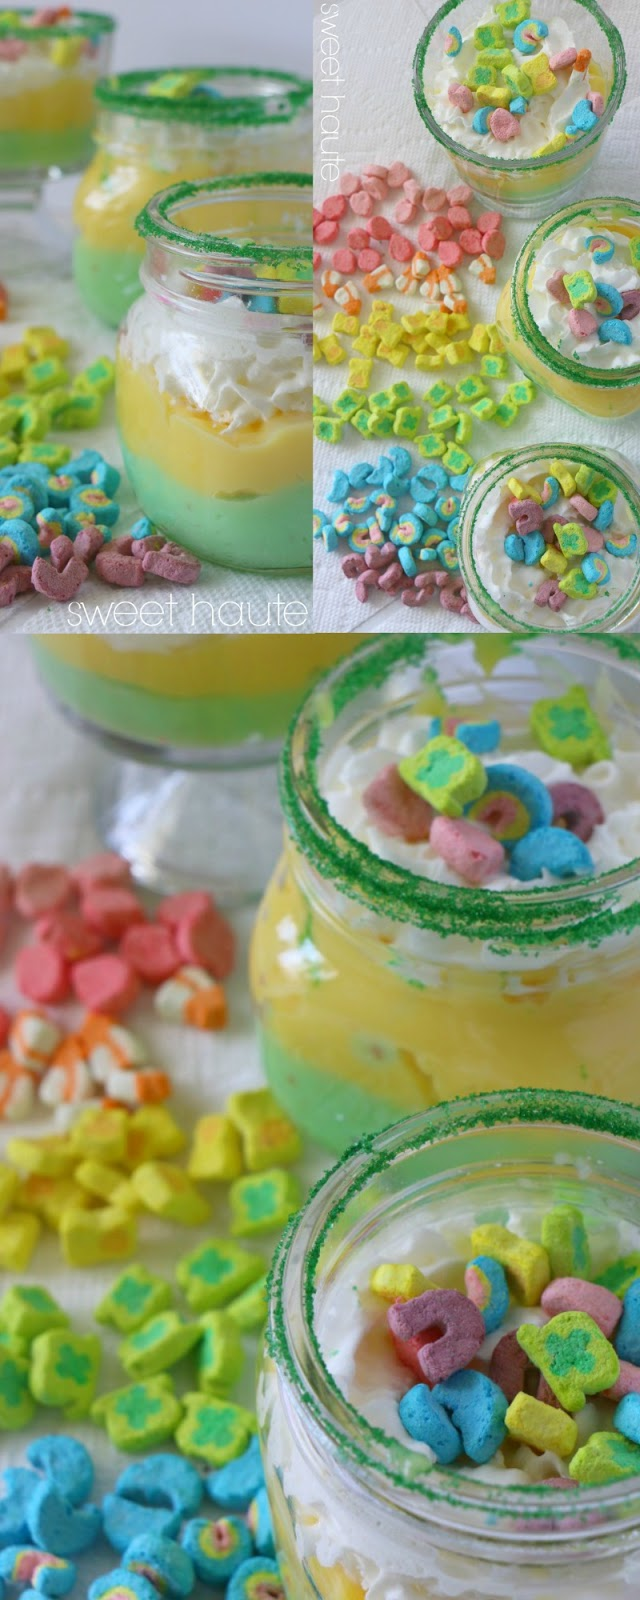 http://sweethaute.blogspot.com/2015/03/st-patricks-day-lucky-pudding.html